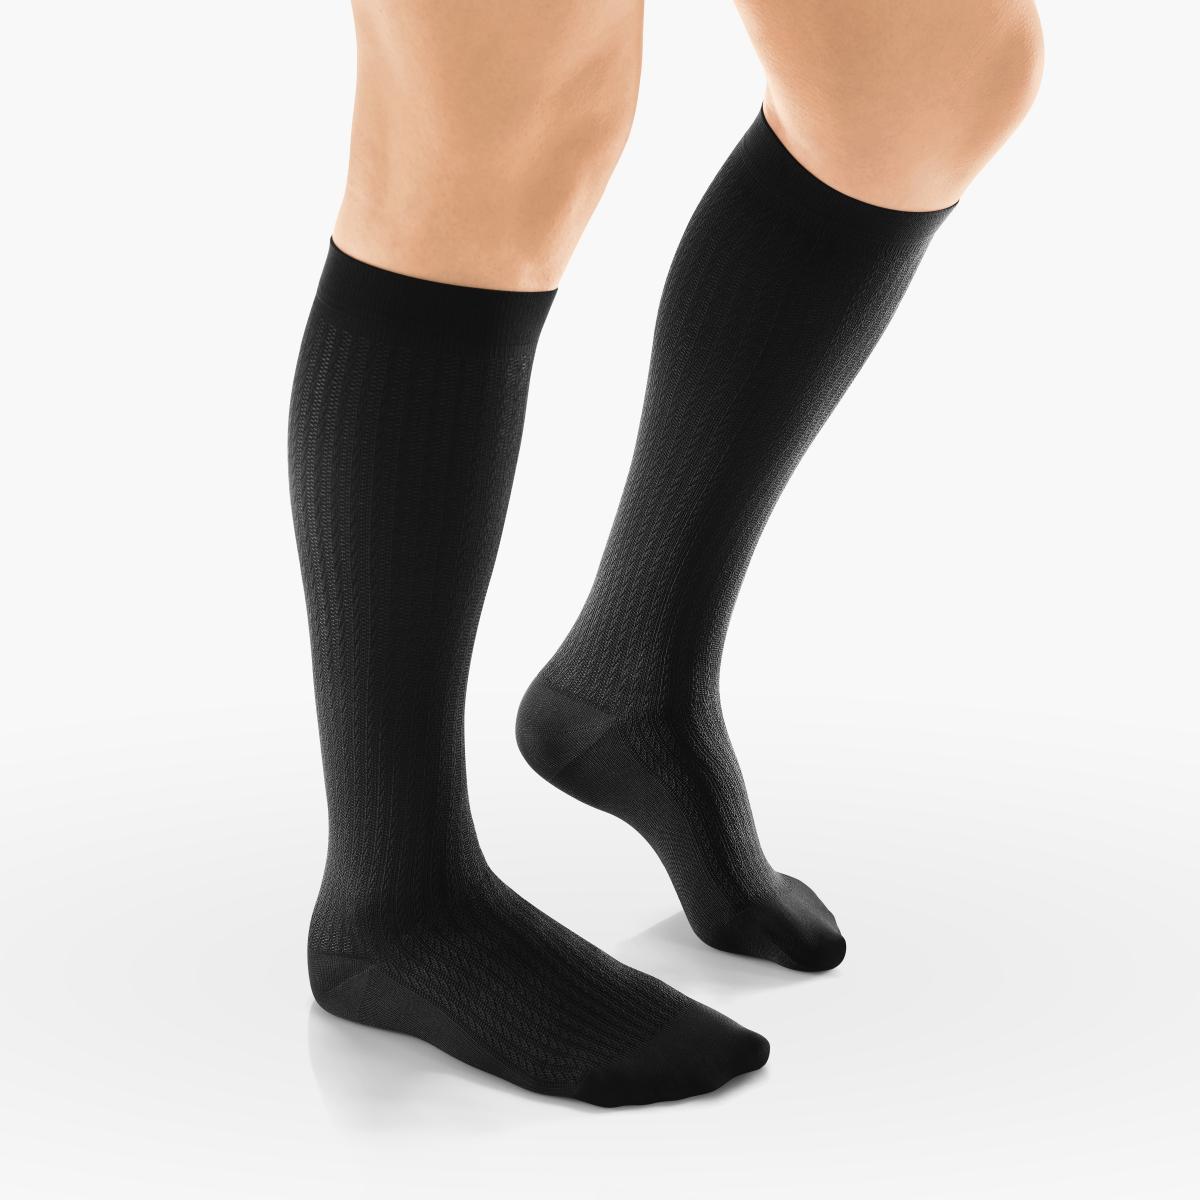 VENOSAN Sup F Women, Chain P, Below Knee 15-20, Black, S, Moderate 15-20 mmHg   Black   S      Closed Toe   Knit Top